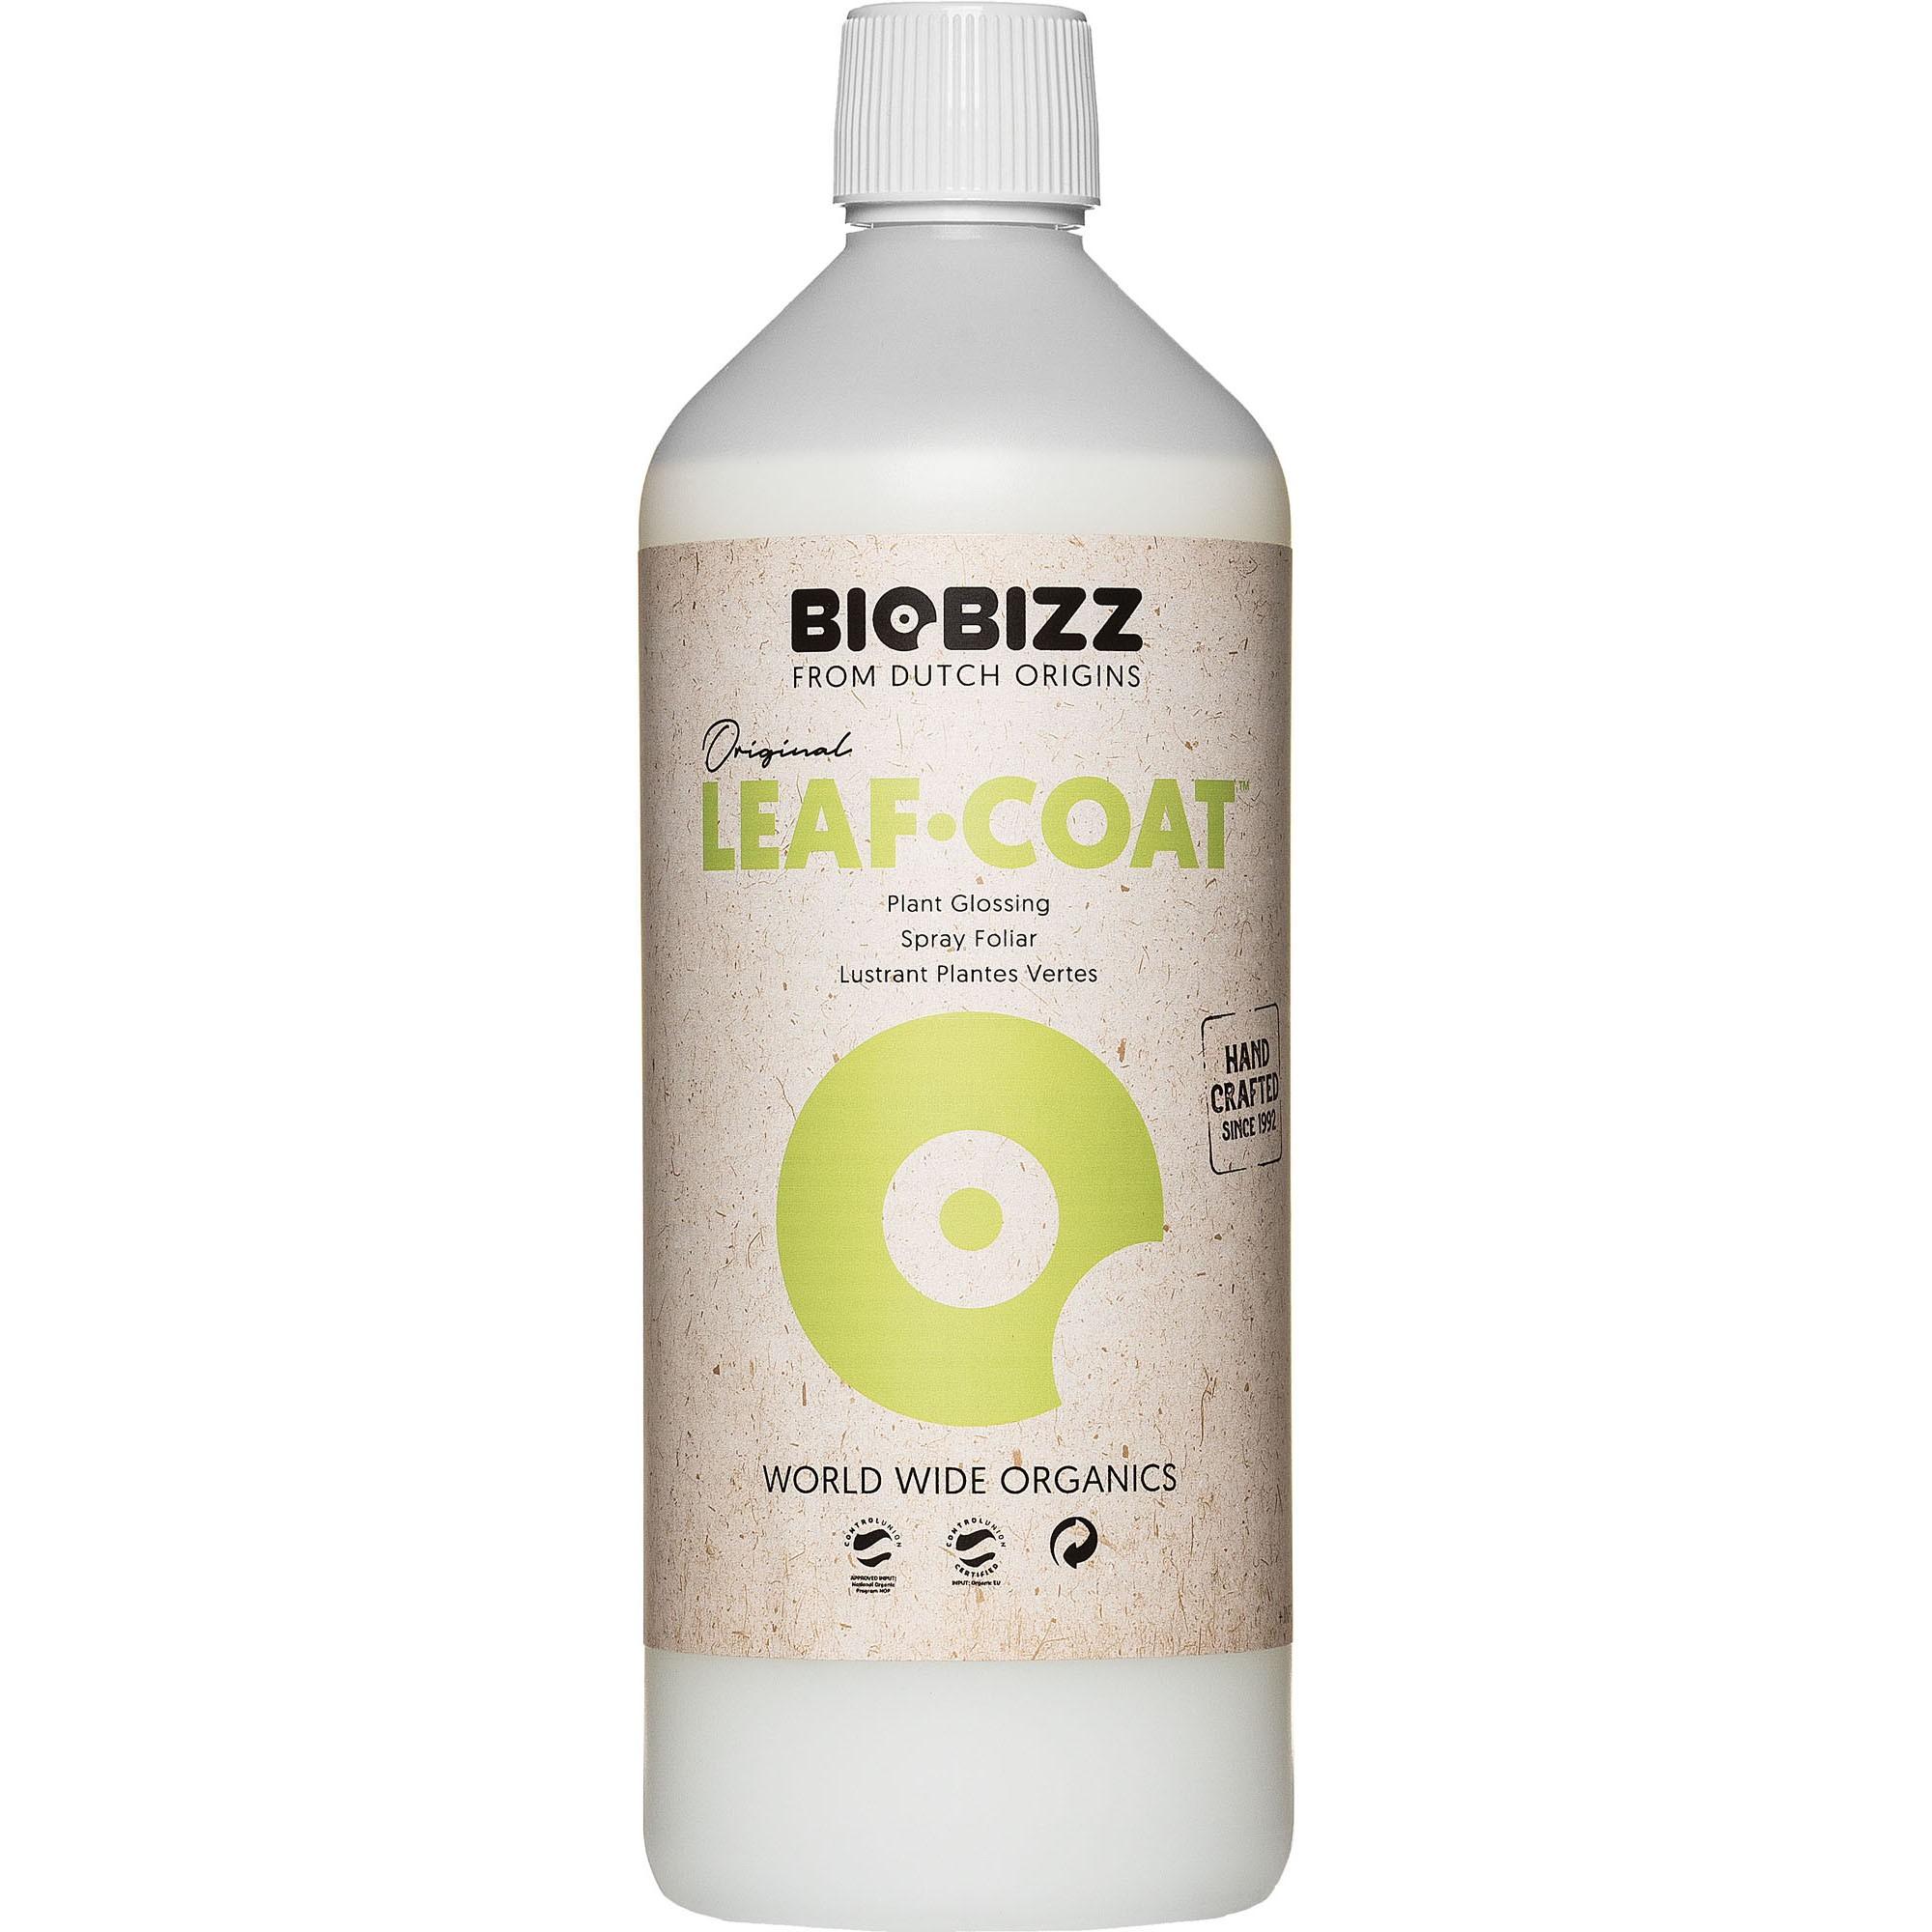 Biboizz Leaf-Coat 1L